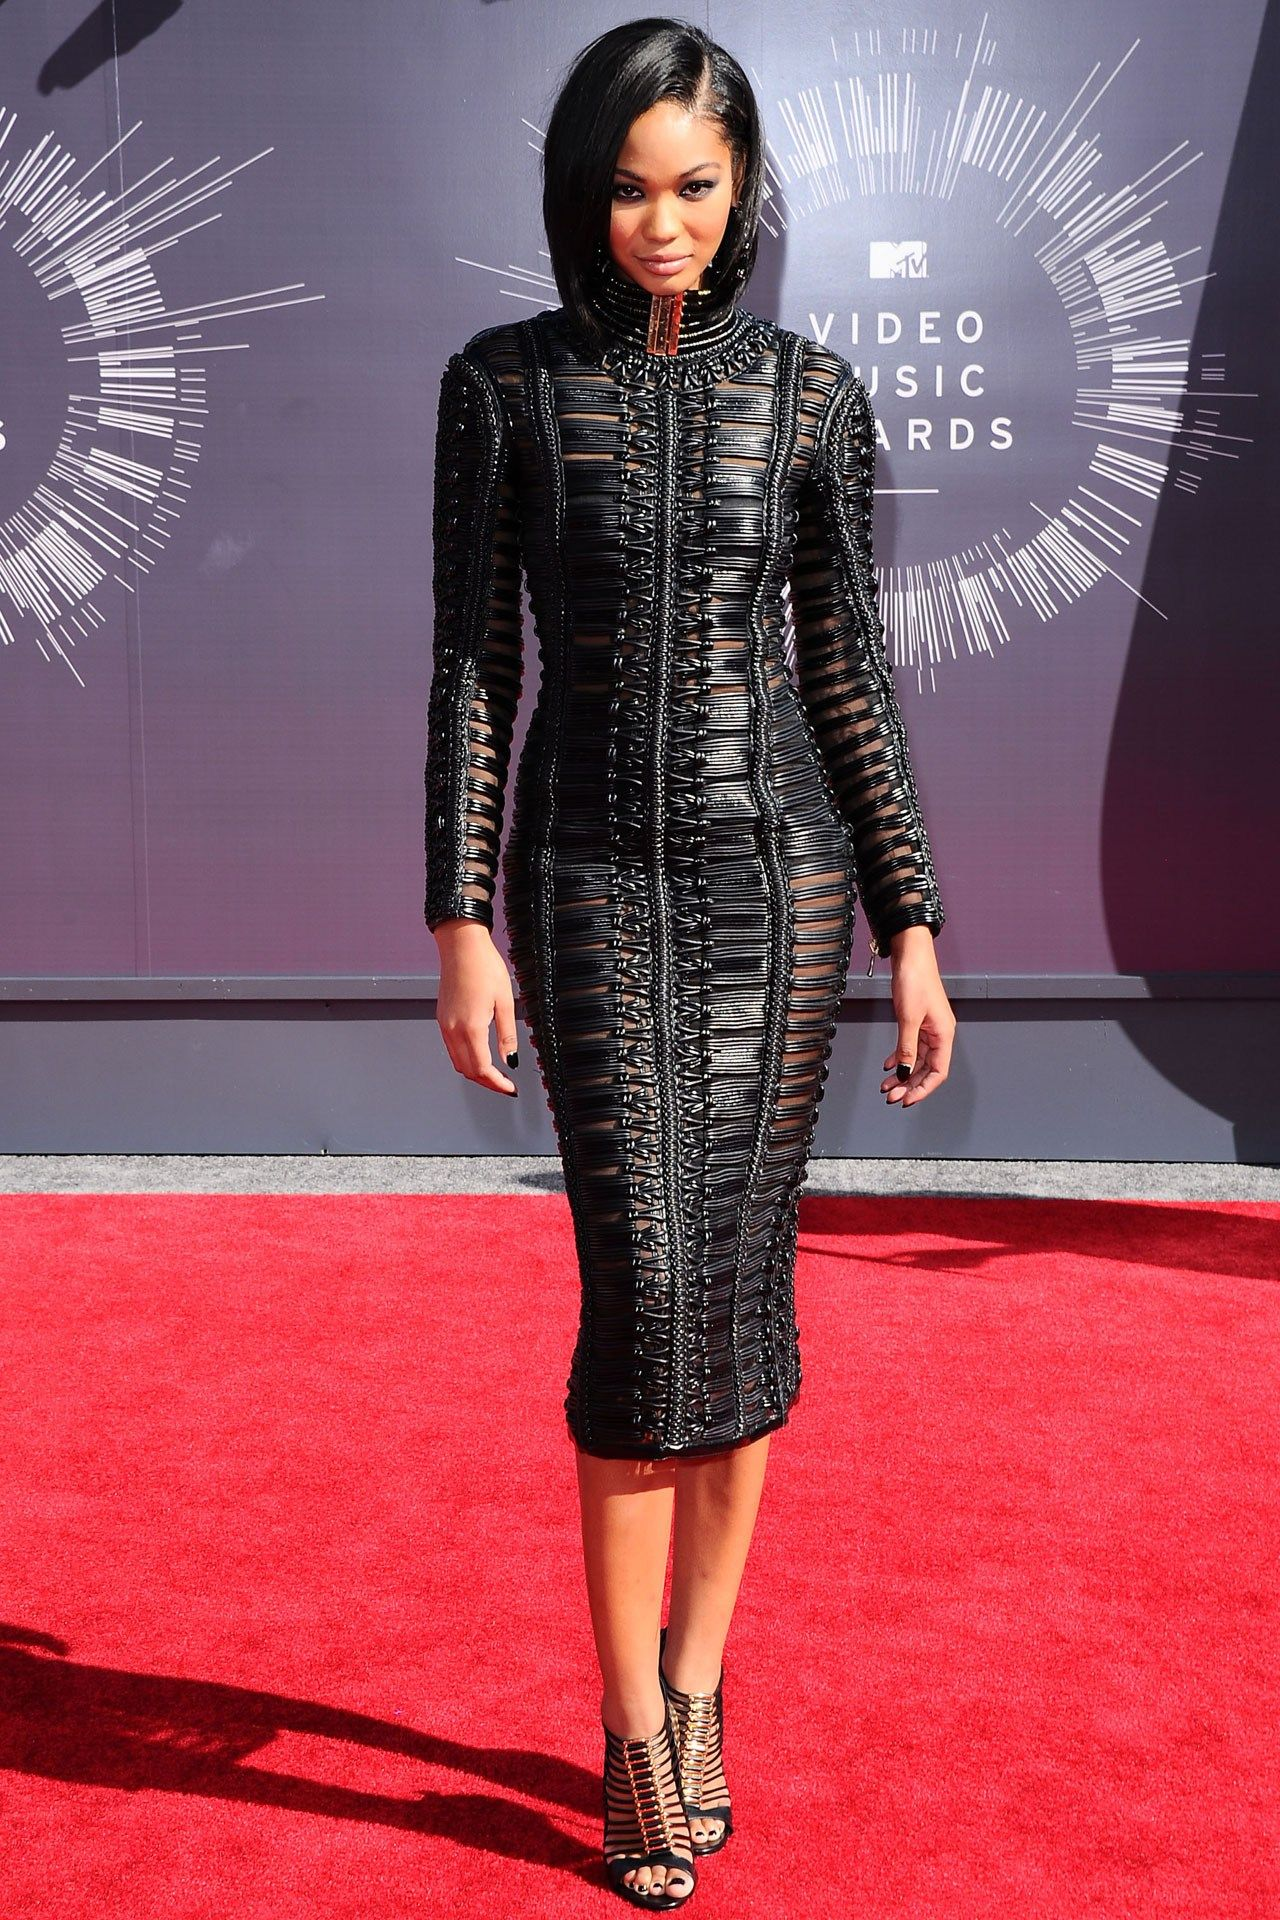 Chanel Iman wore a Balmain dress with Casadei heels.